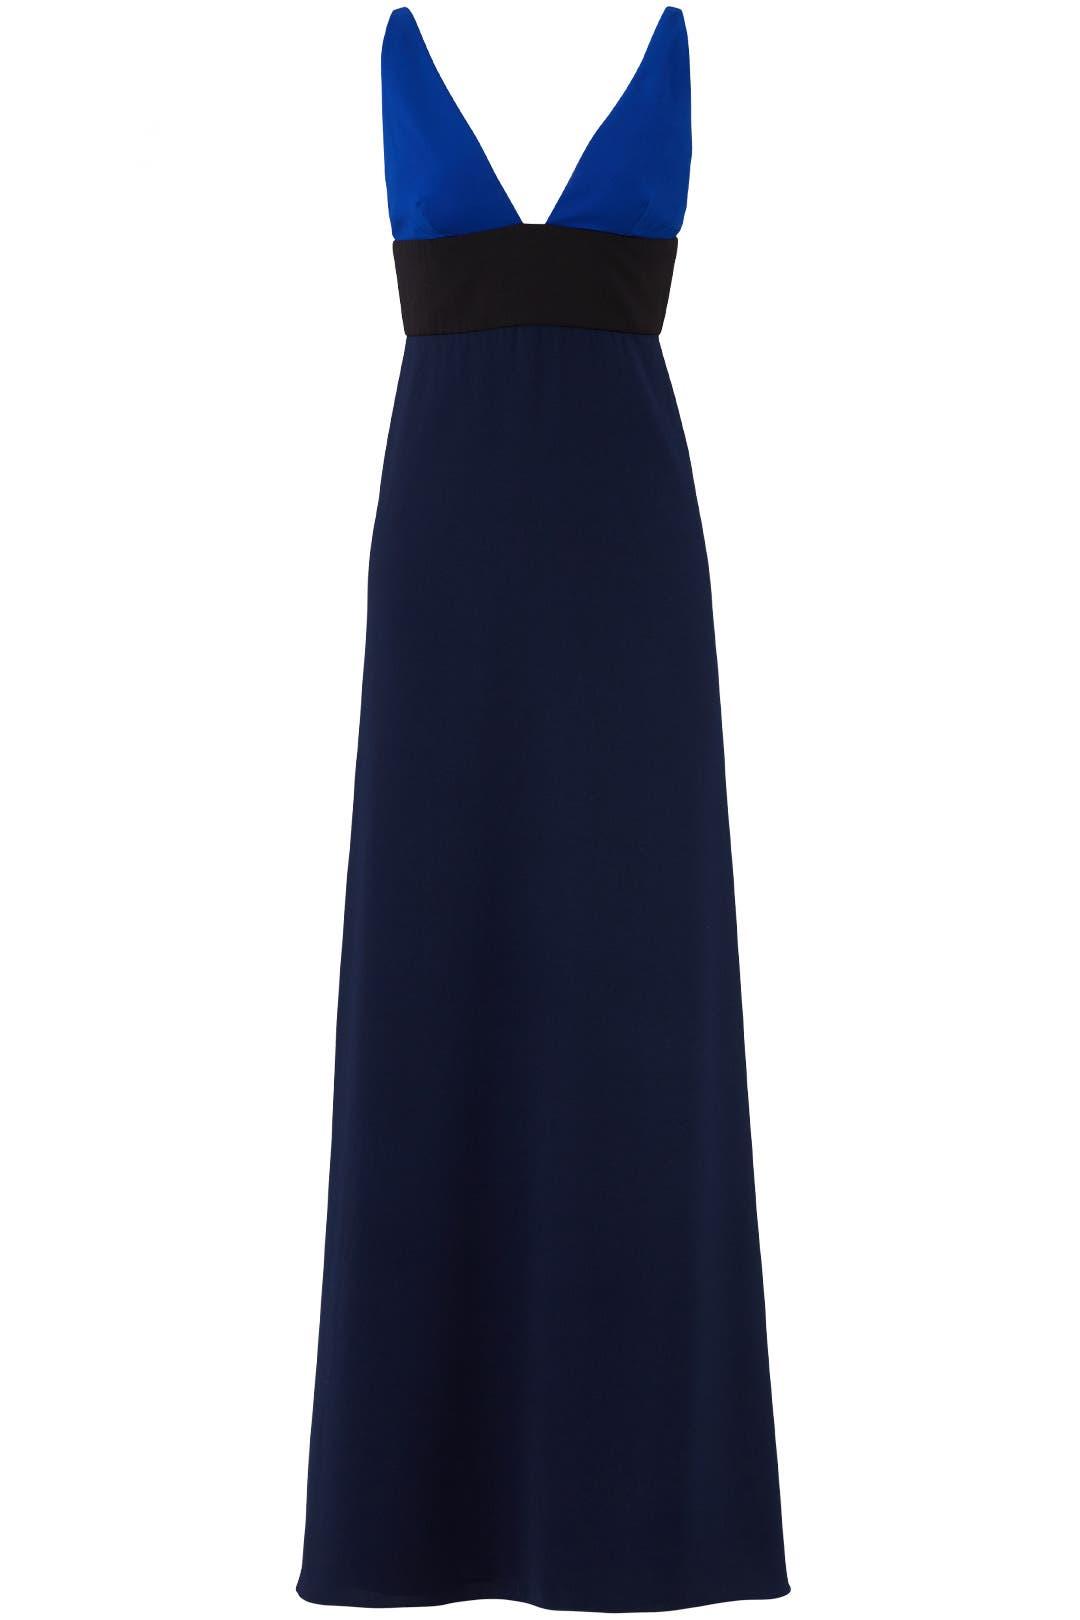 Midnight Blue Gown by Jill Jill Stuart for $50 - $70   Rent the Runway